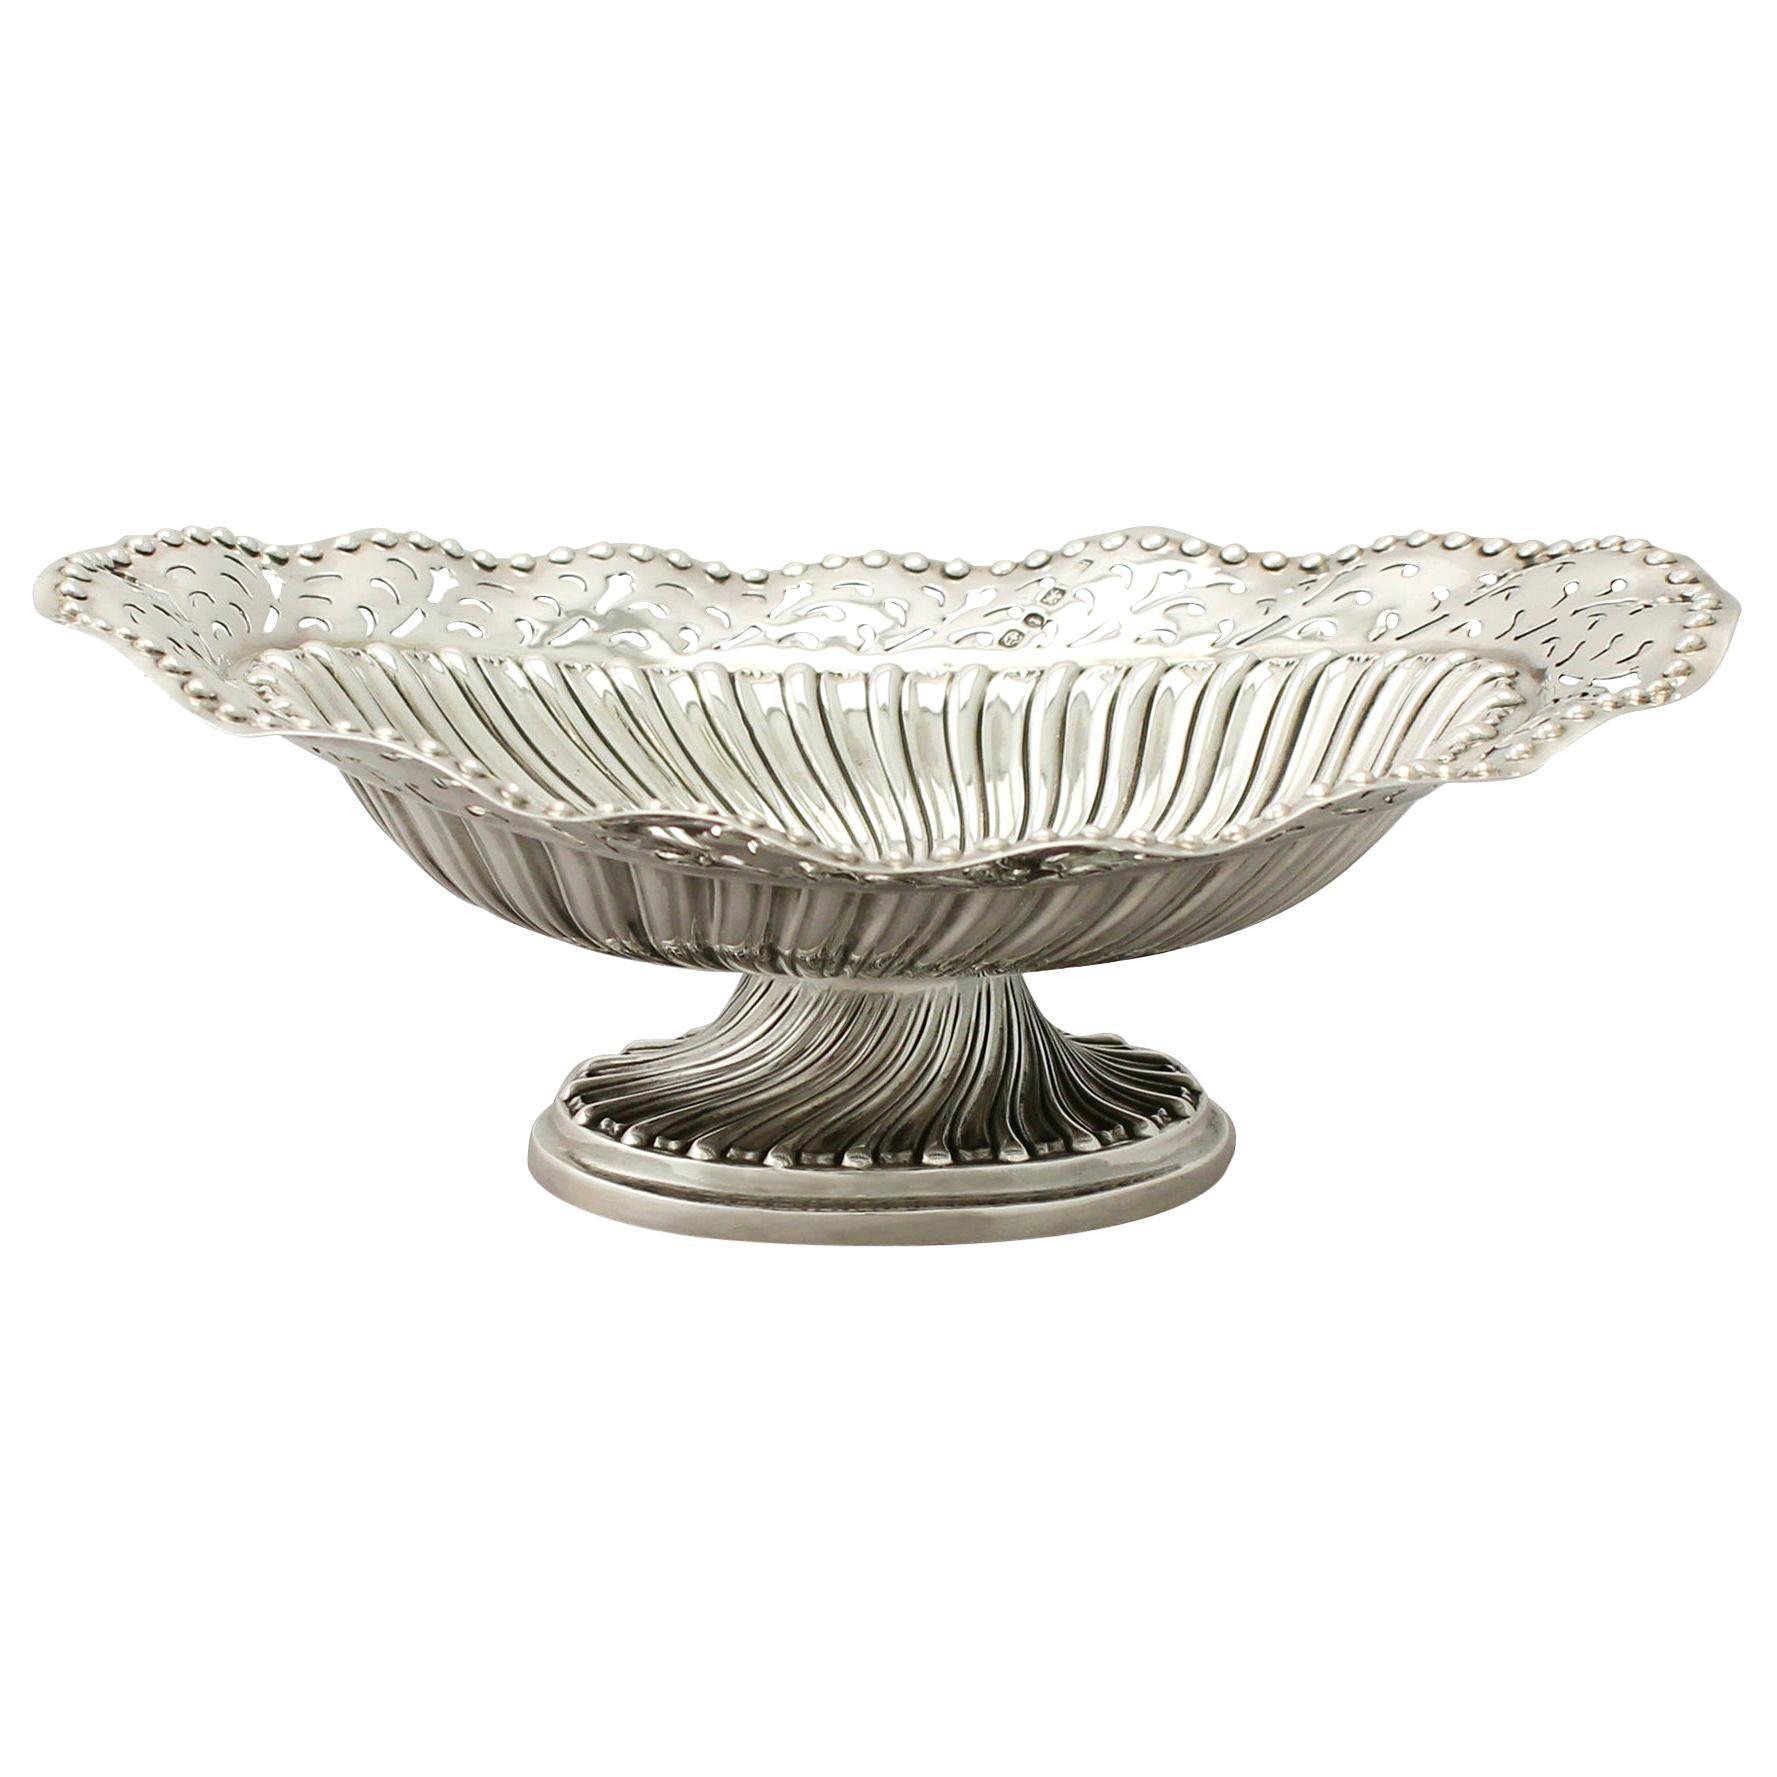 Antique Victorian Sterling Silver Bon Bon Dish